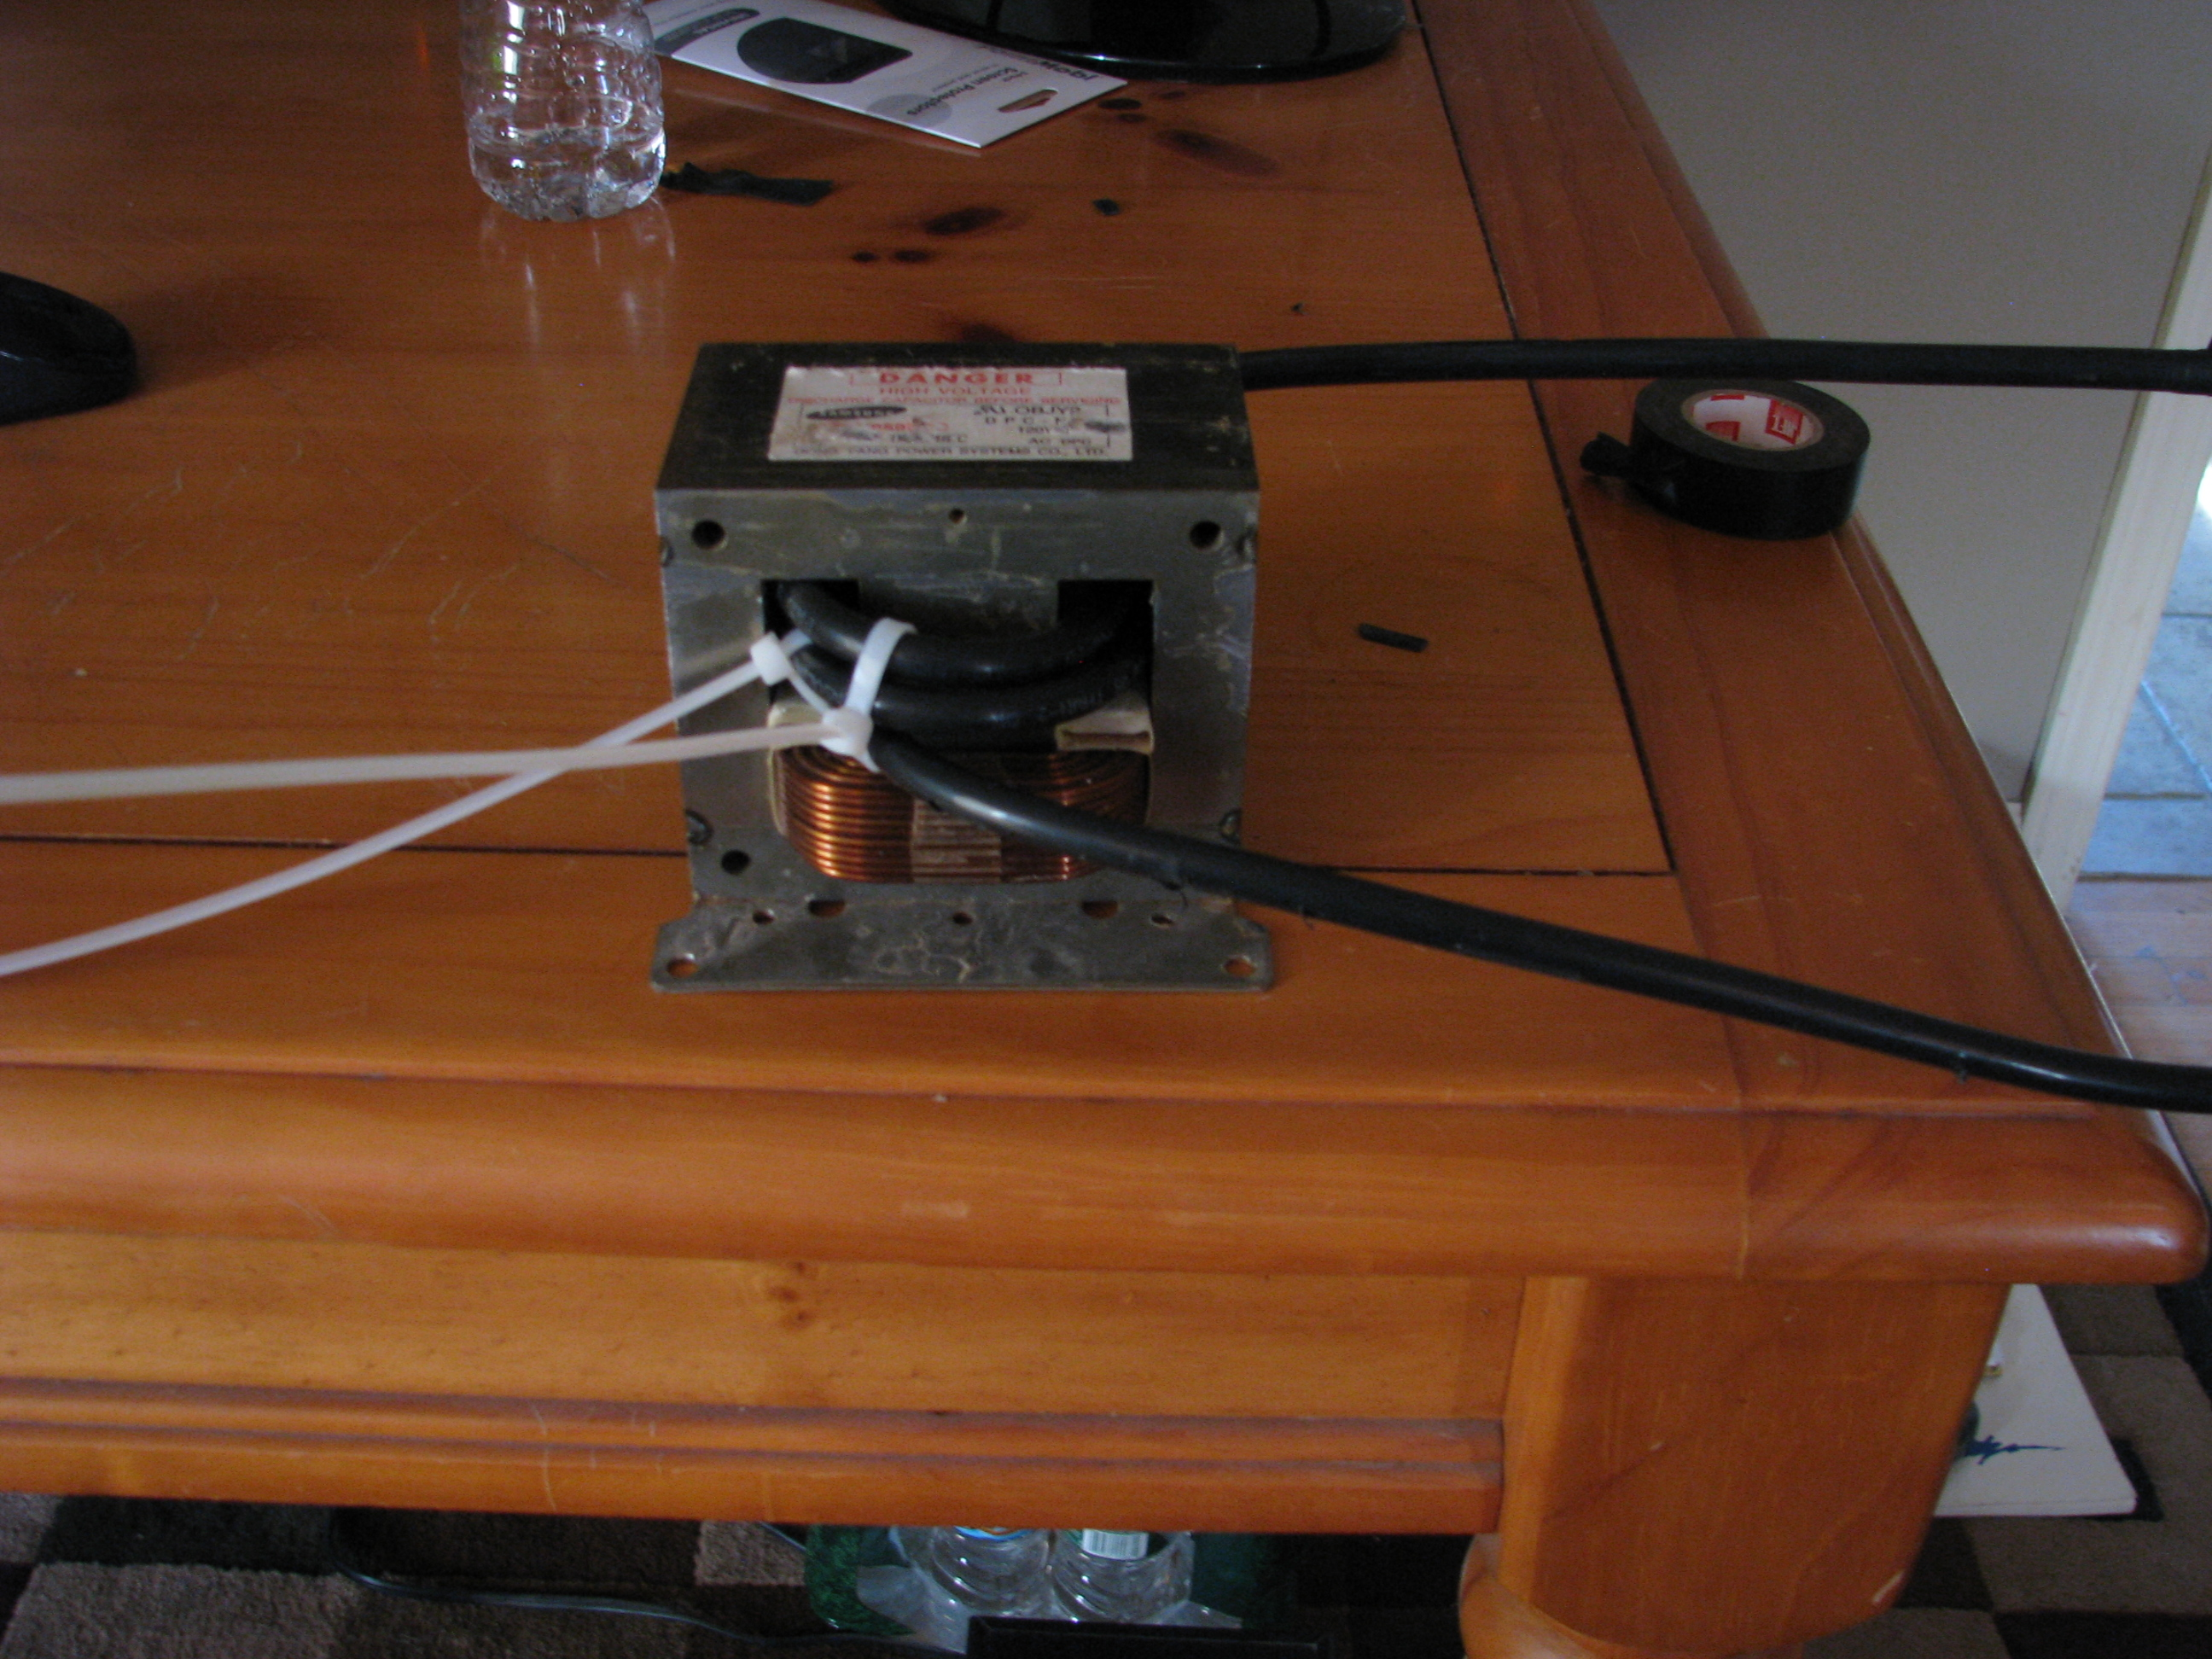 Diy Microwave Spotwelder With Control Circuit Apex Logic Spot Welding Wiring Diagram Img 2890